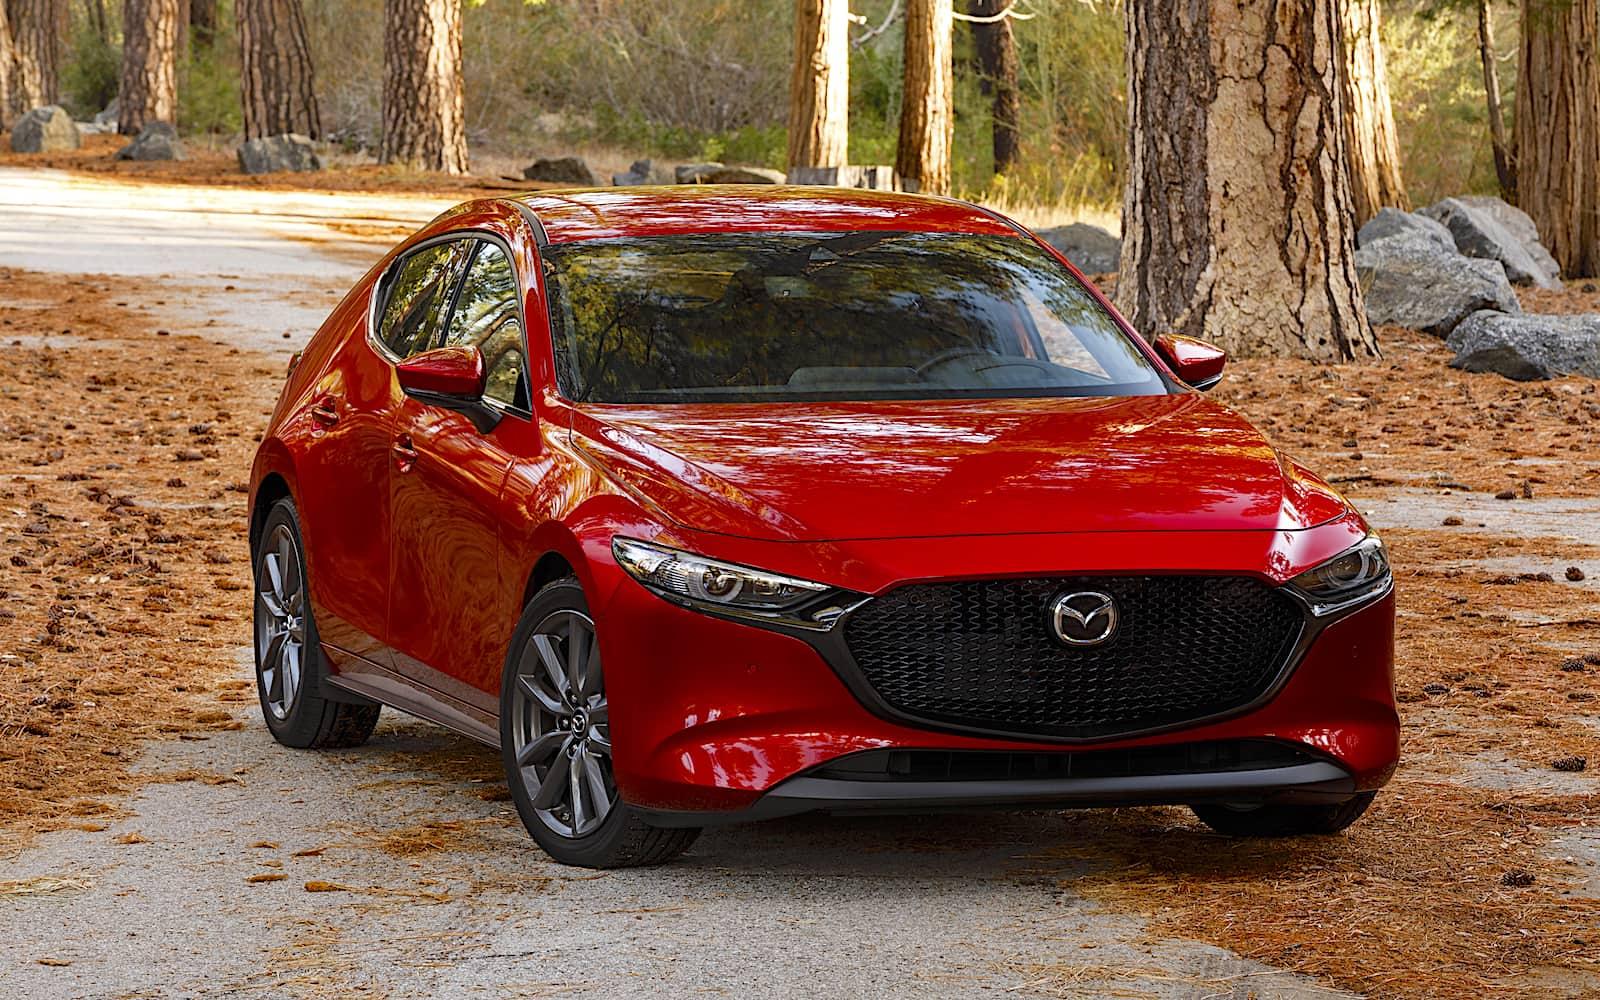 15 Best Review Mazda 3 2020 Lanzamiento History with Mazda 3 2020 Lanzamiento